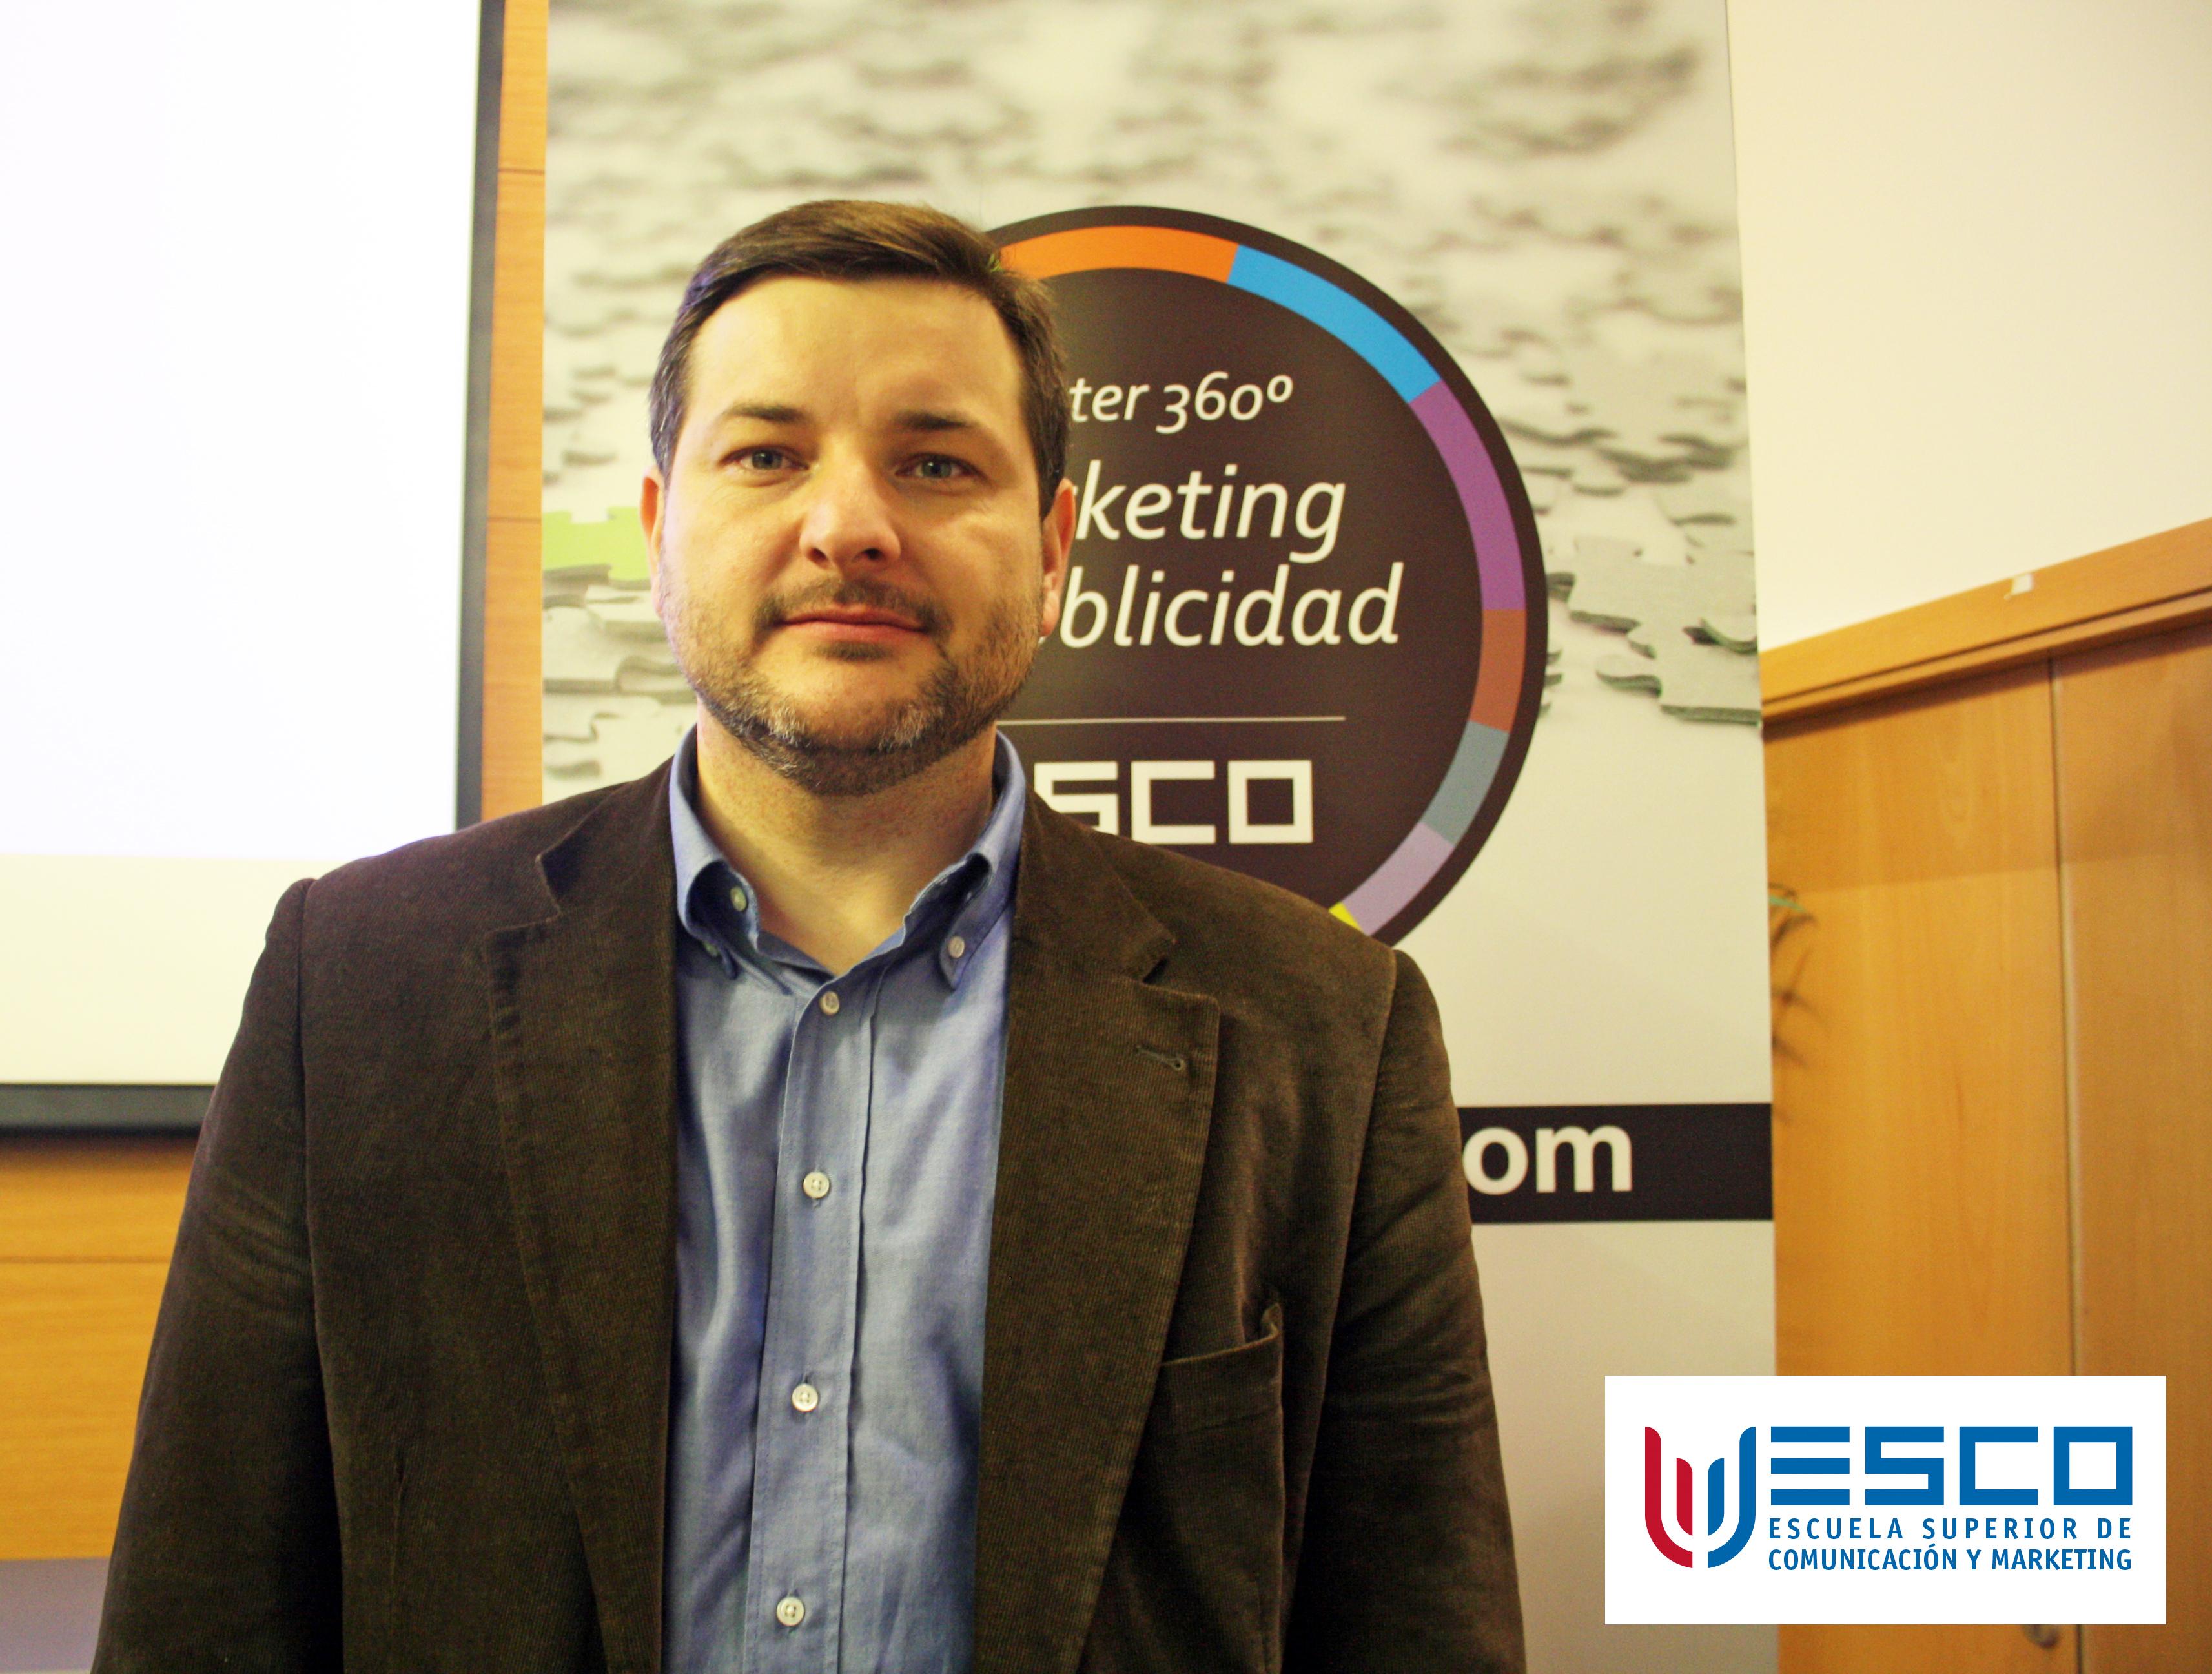 Javier Suso Malaga Smoke Selling